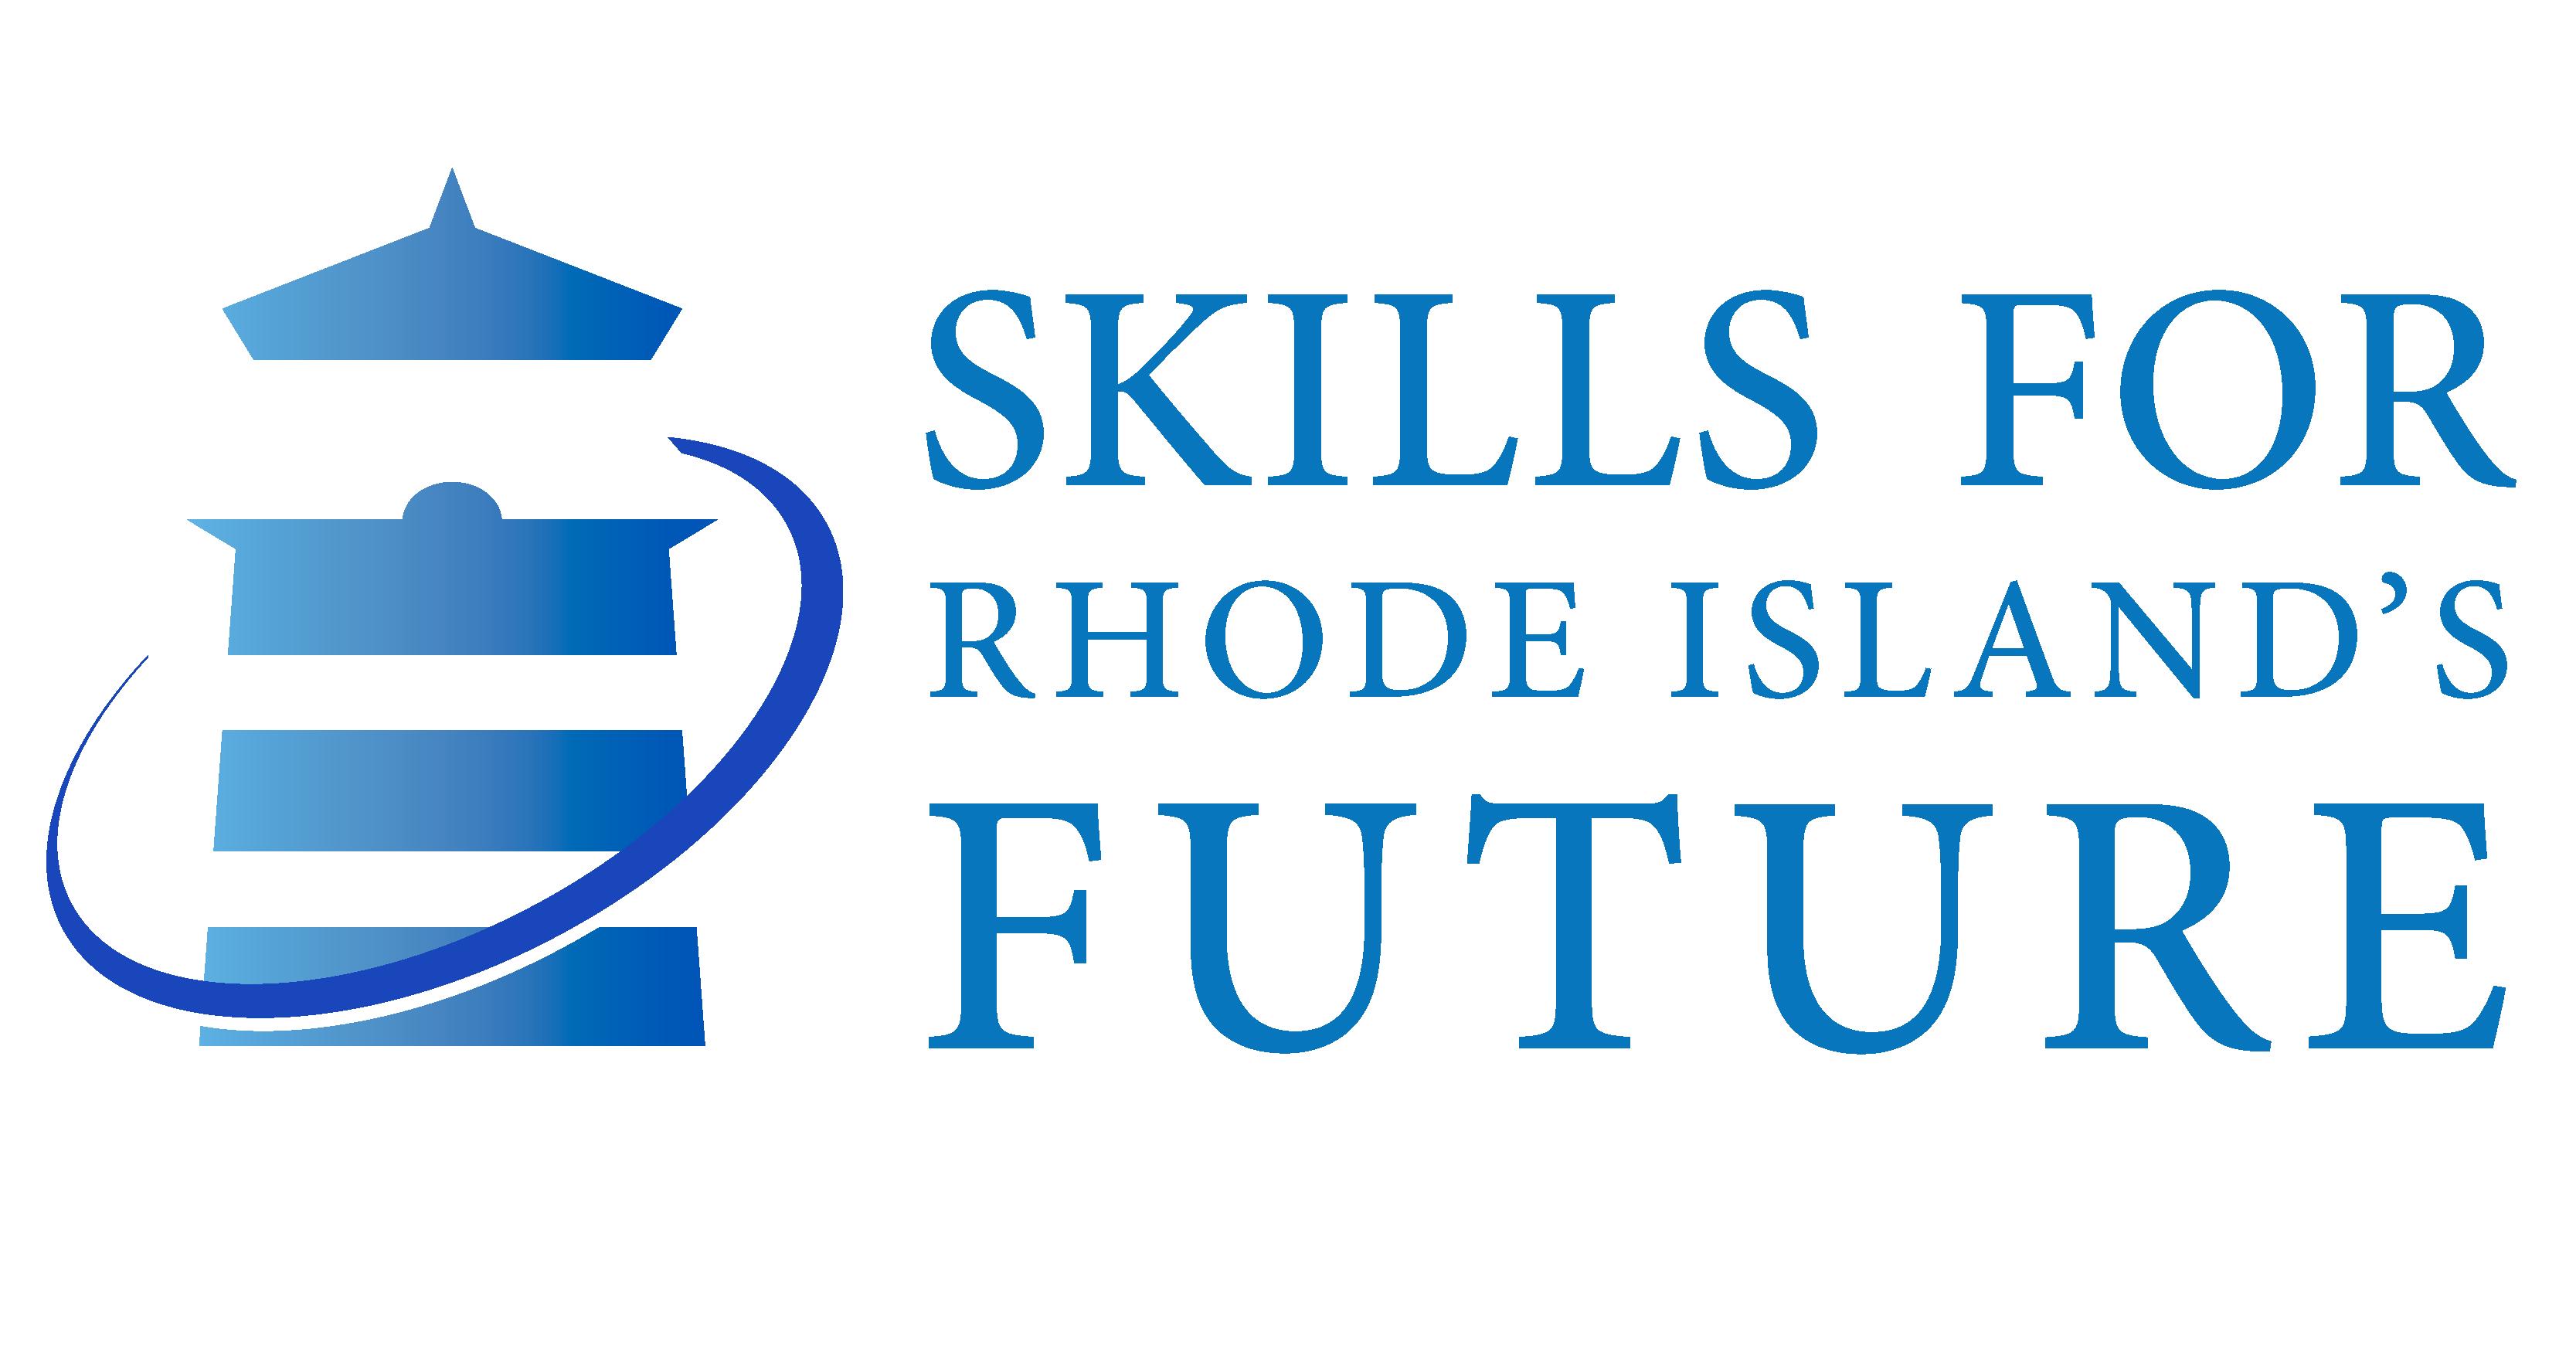 Skills-for-RI-Future-LOGO-12-17